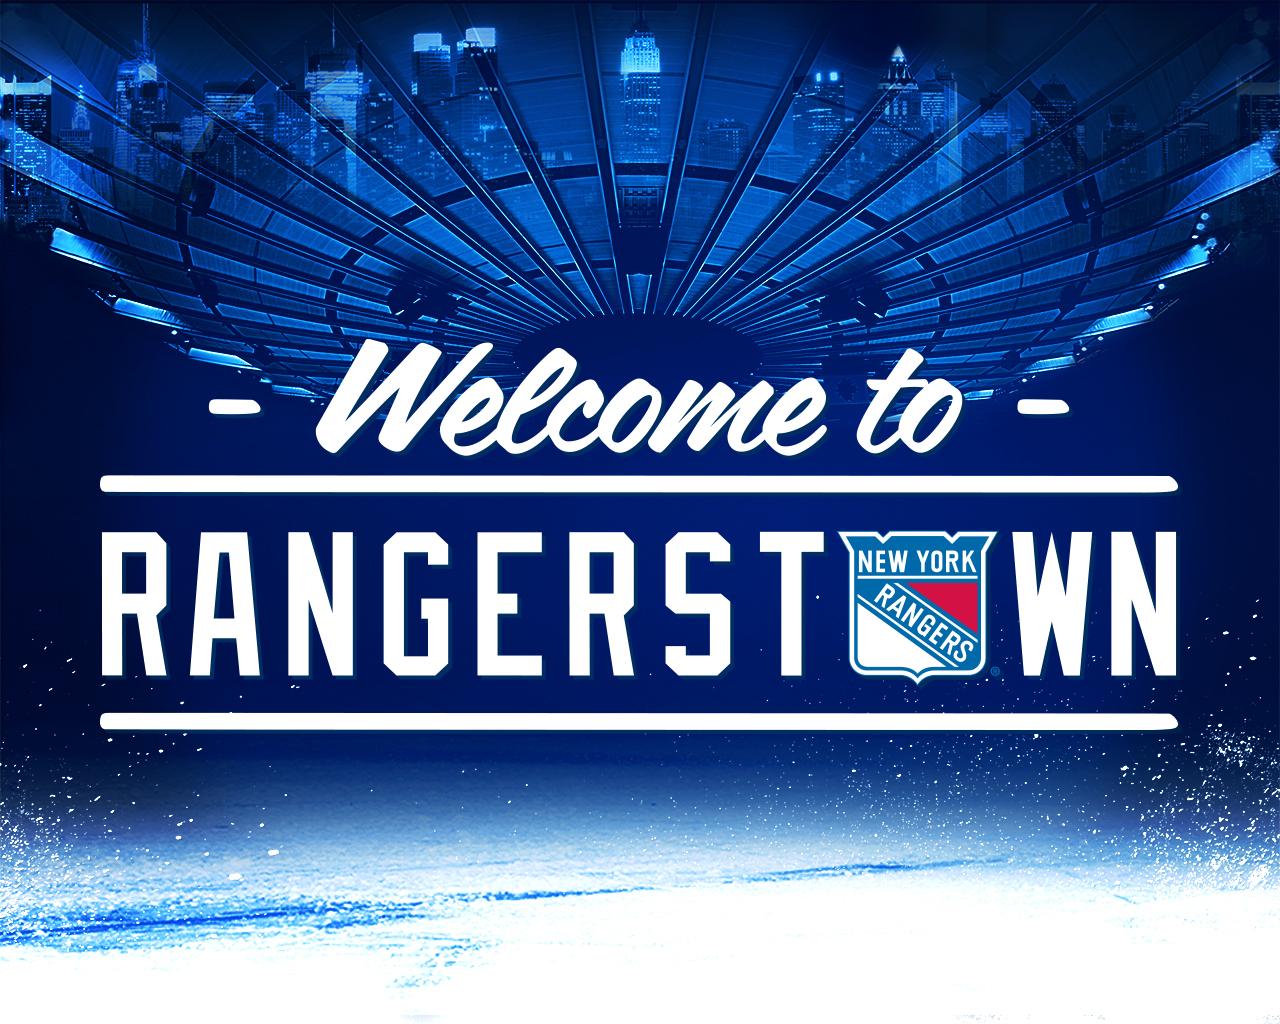 NewYork Rangers   Rangers Wallpaper   New York Rangers   Fan Zone 1280x1024